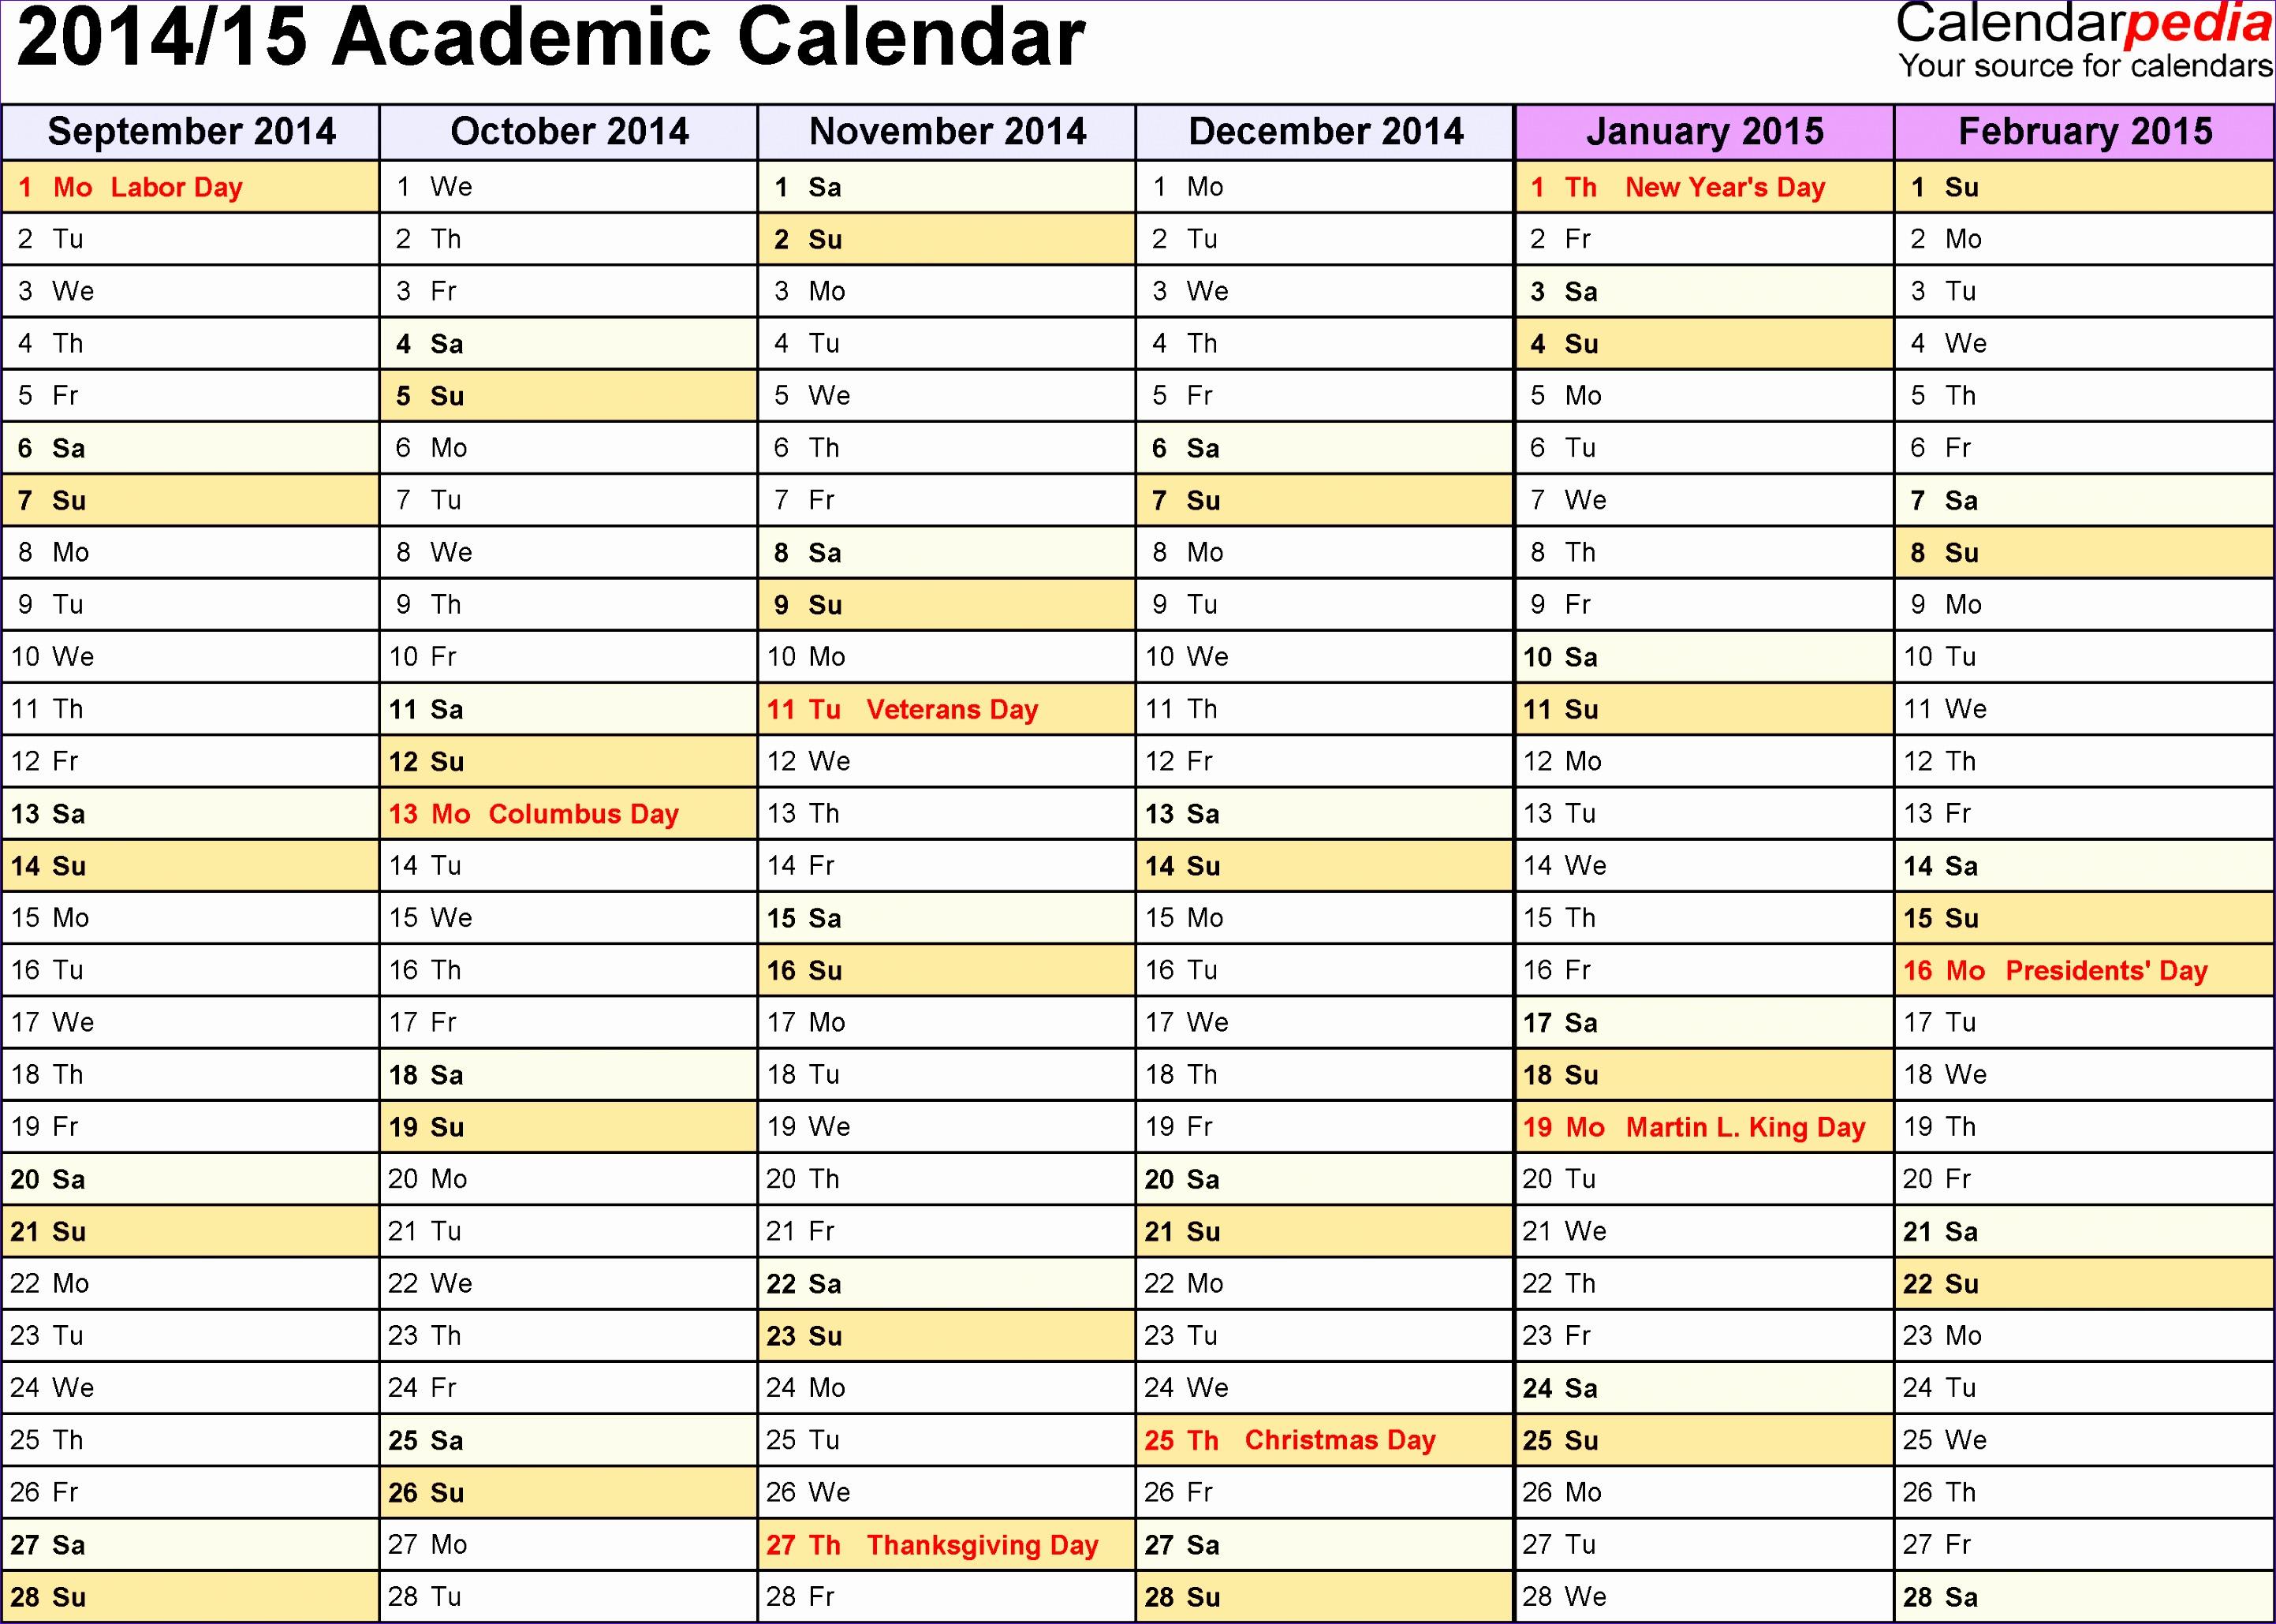 2014 2015 academic calendar 2p